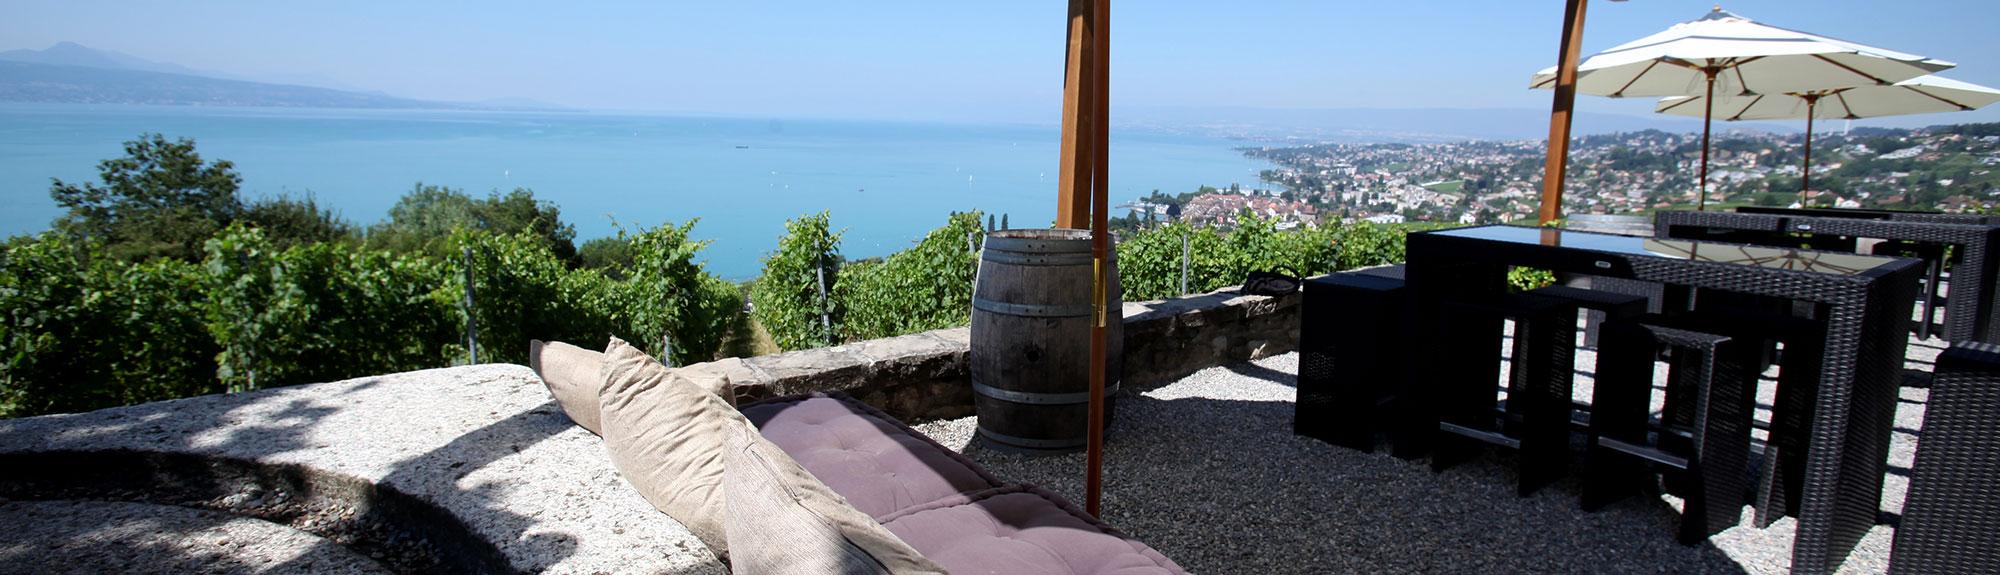 daley-terrasse